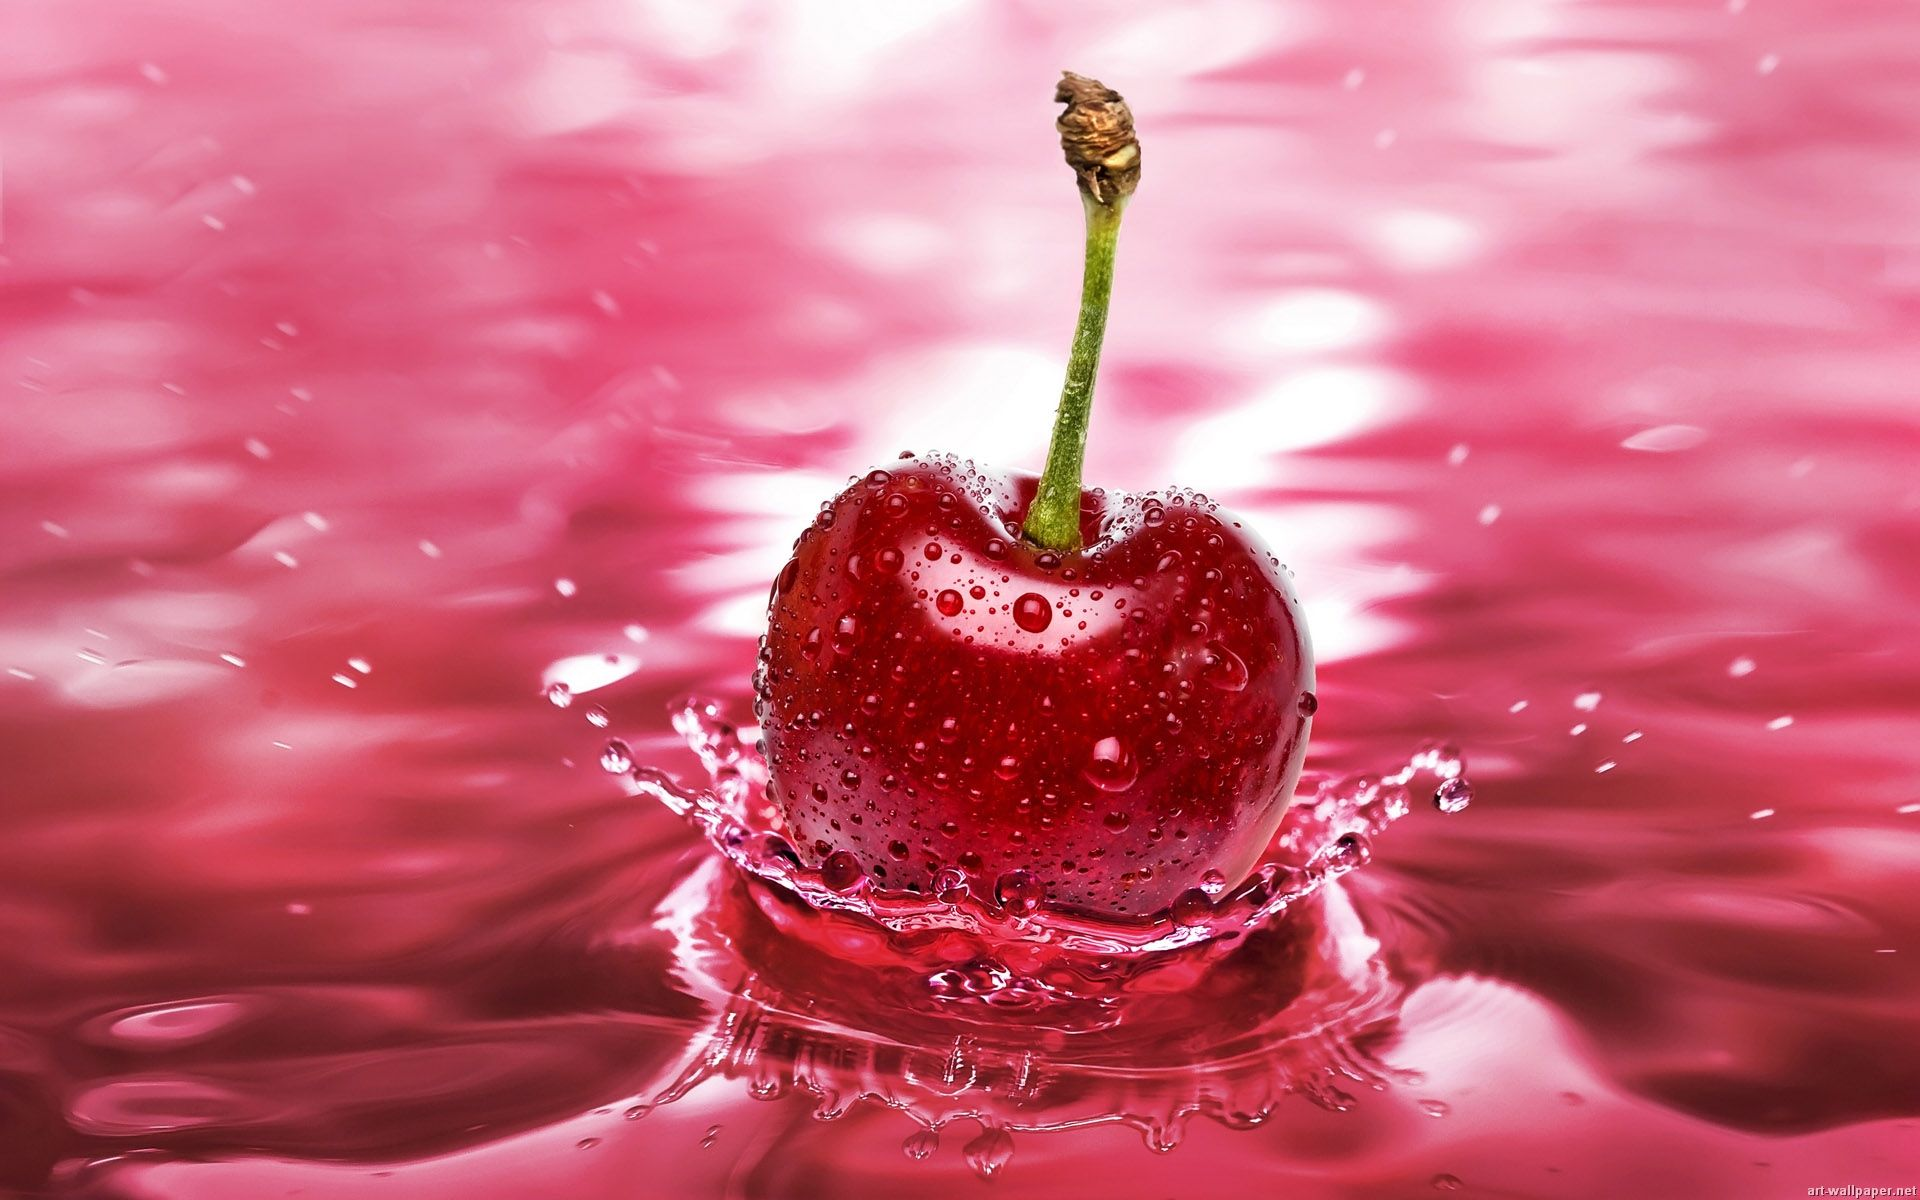 Fresh Red Berry 1080p Hd Wallpaper For Desktop Fruit Splash Fruit Wallpaper Cherry Fruit Hd wallpaper red fruit cherries berries